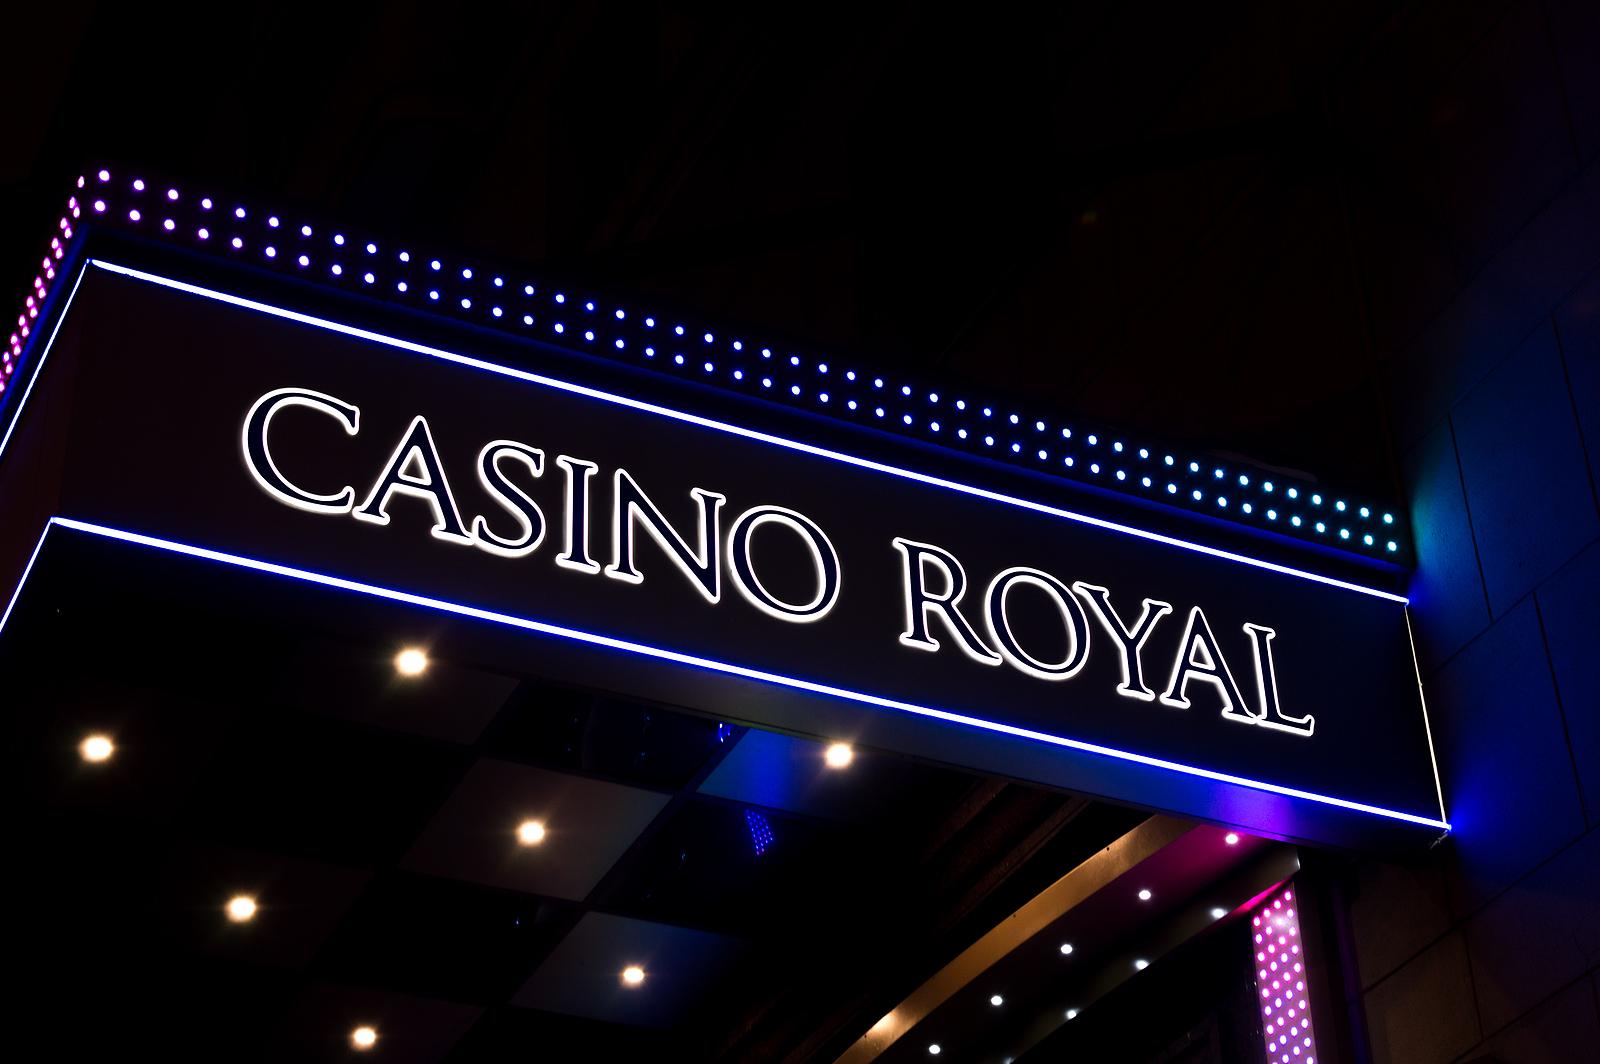 The Casino Royal, Minsk